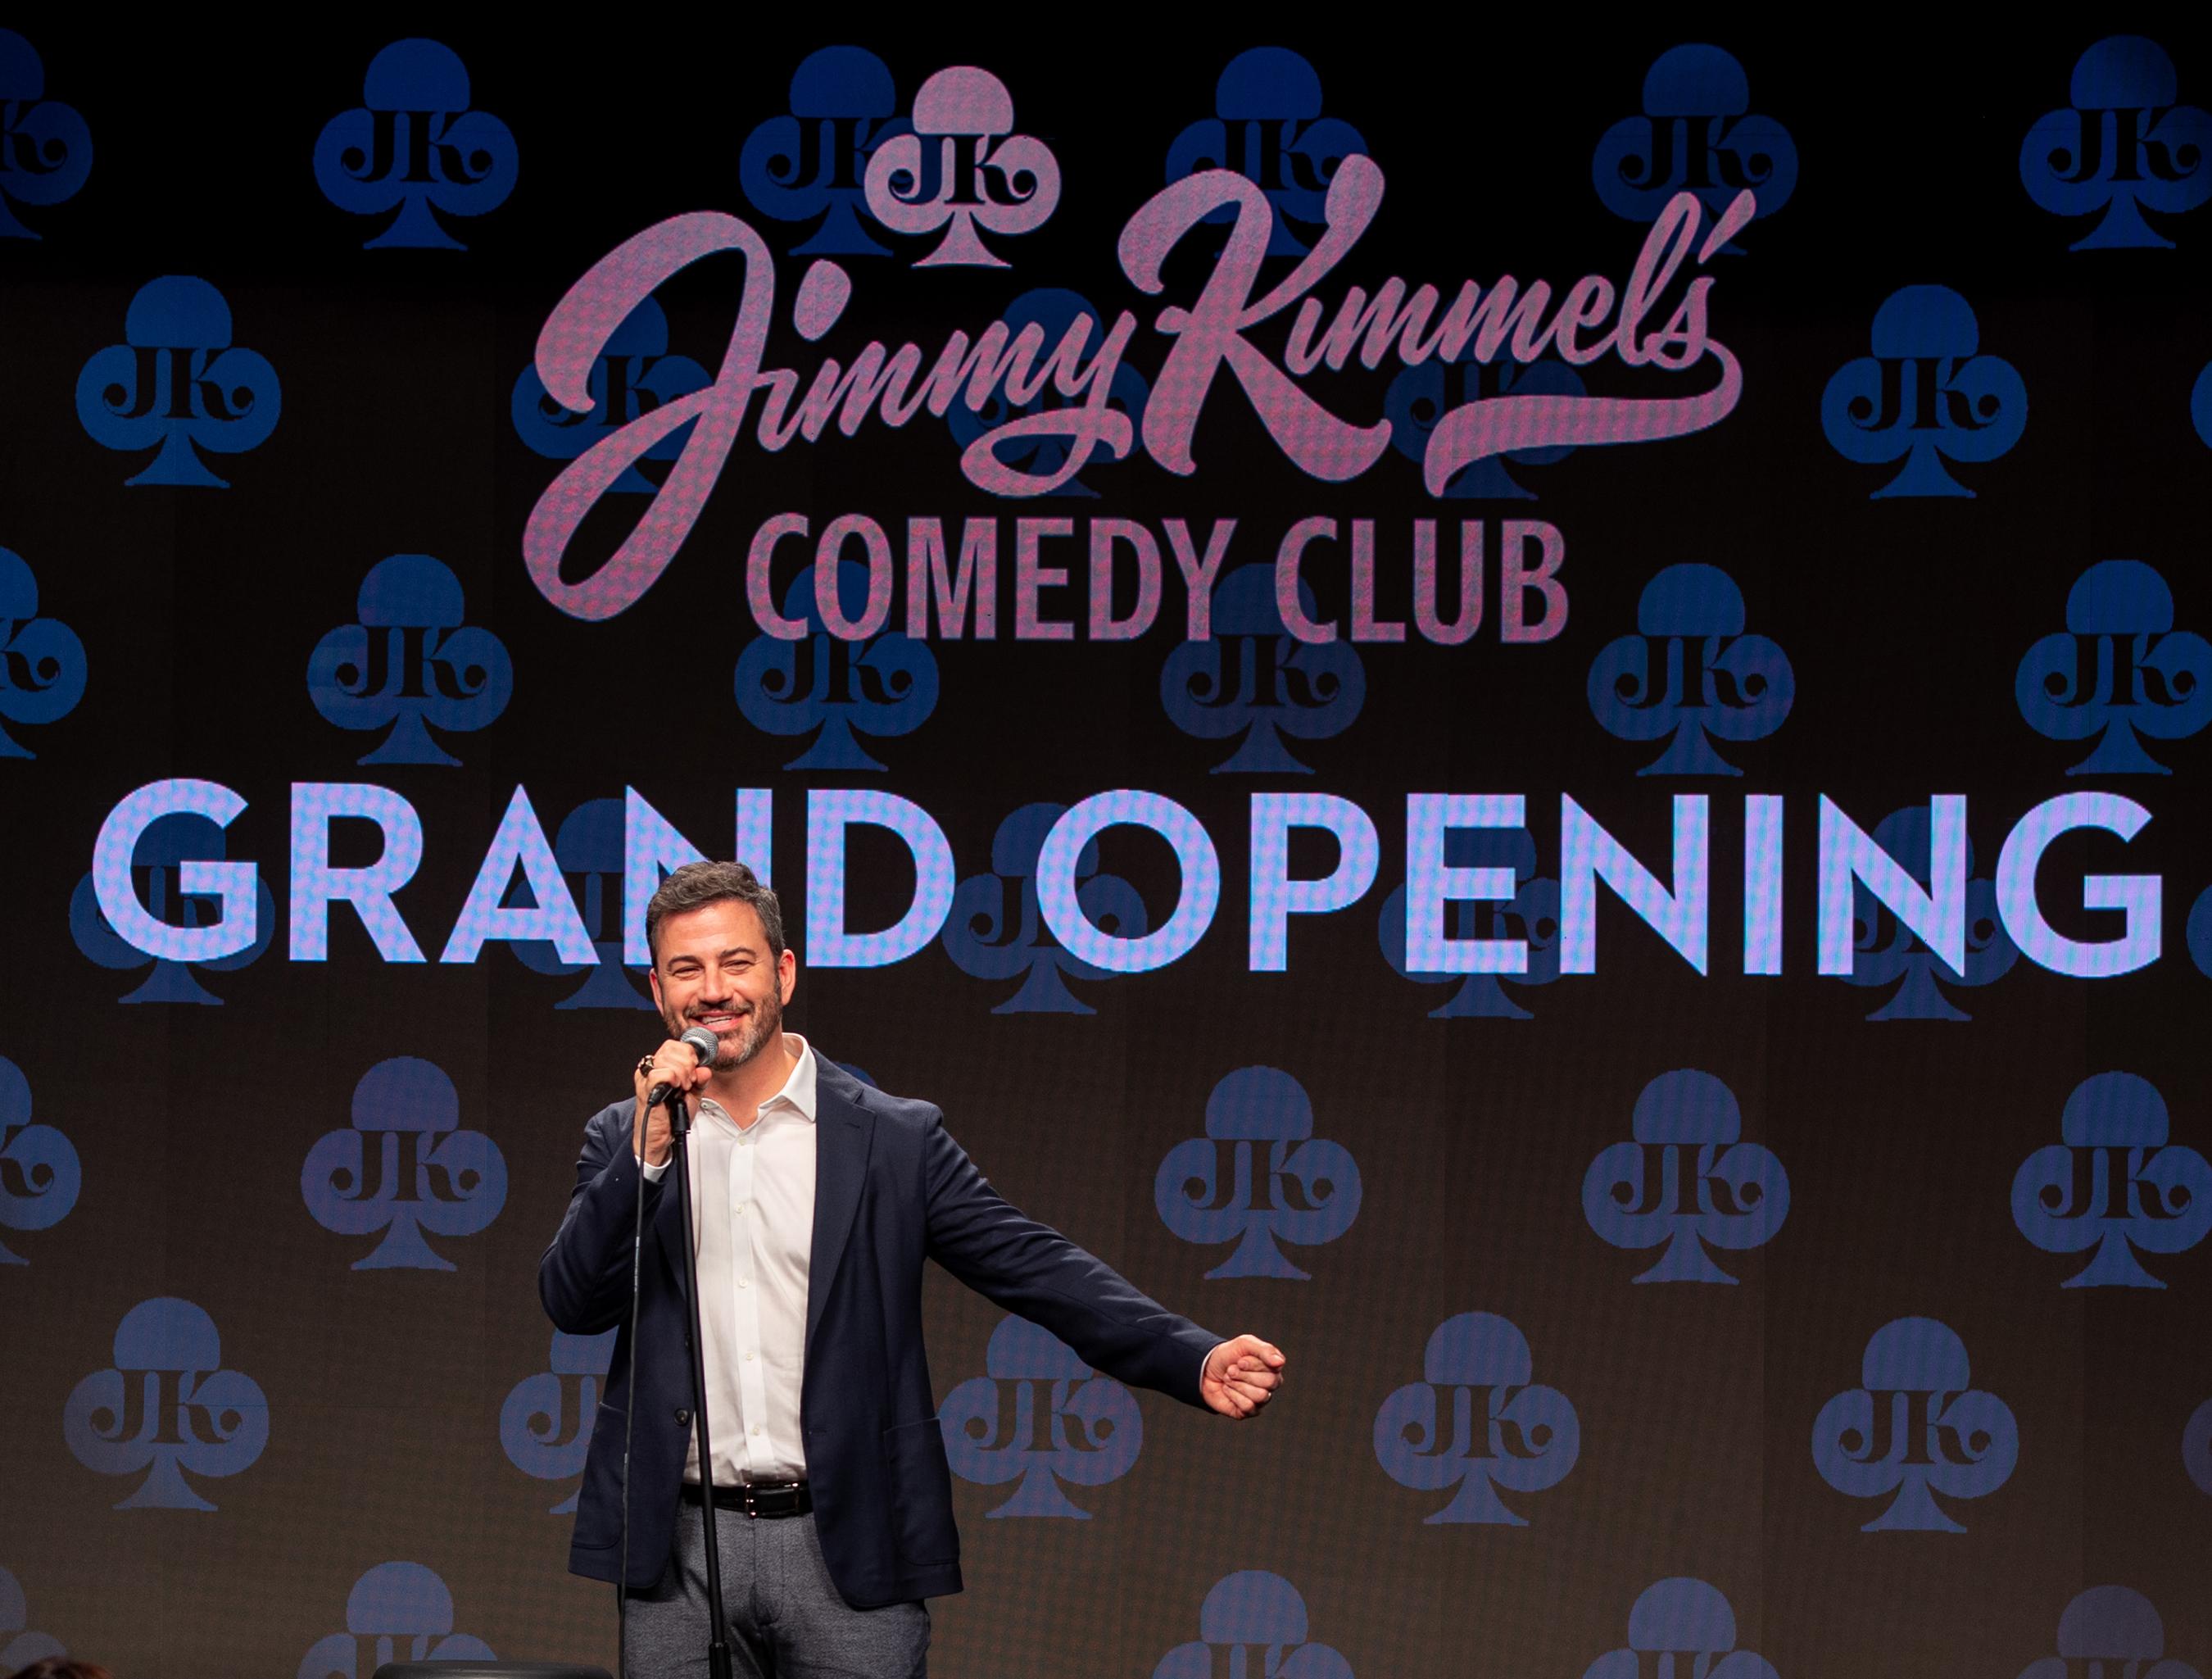 Jimmy Kimmel's Comedy Club Grand Opening (Photo Credit: Kabik Photo Group)